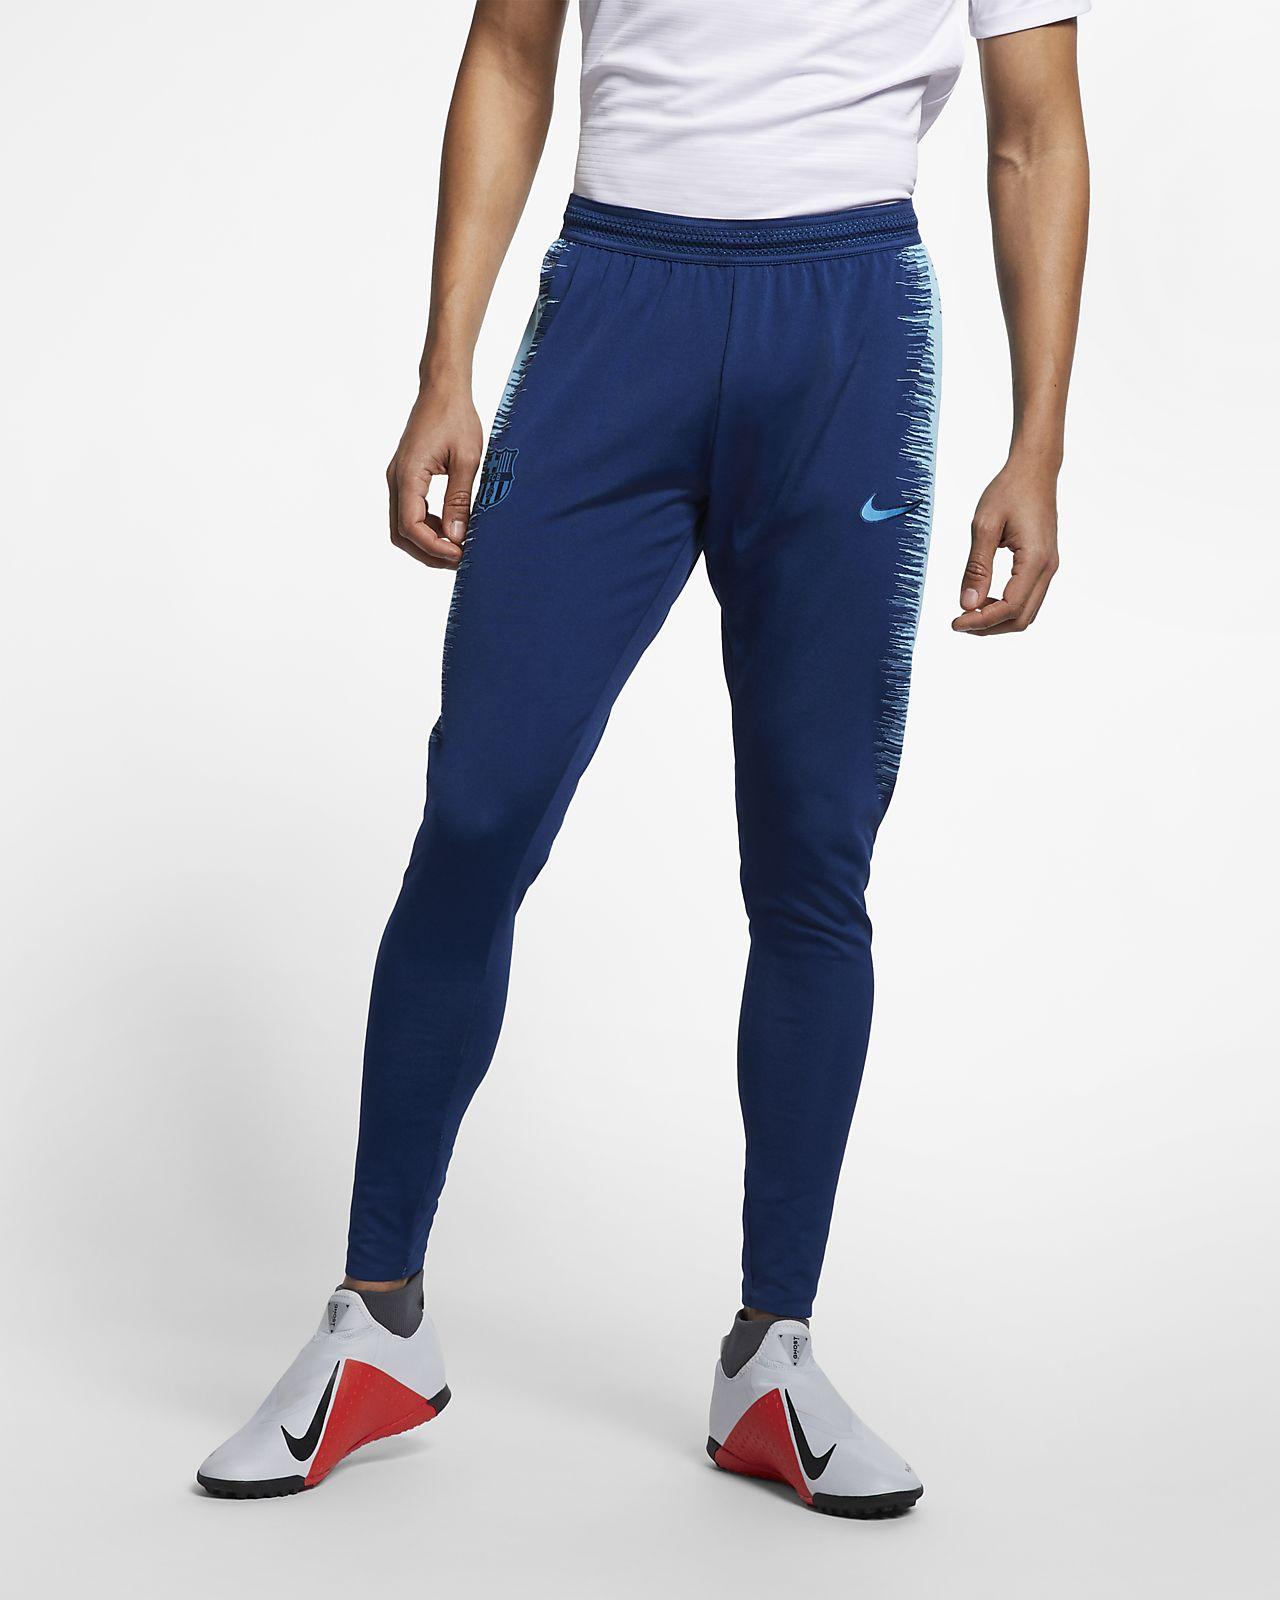 90129dc56bdec FC Barcelona VaporKnit Strike Men s Football Pants. Nike.com GB